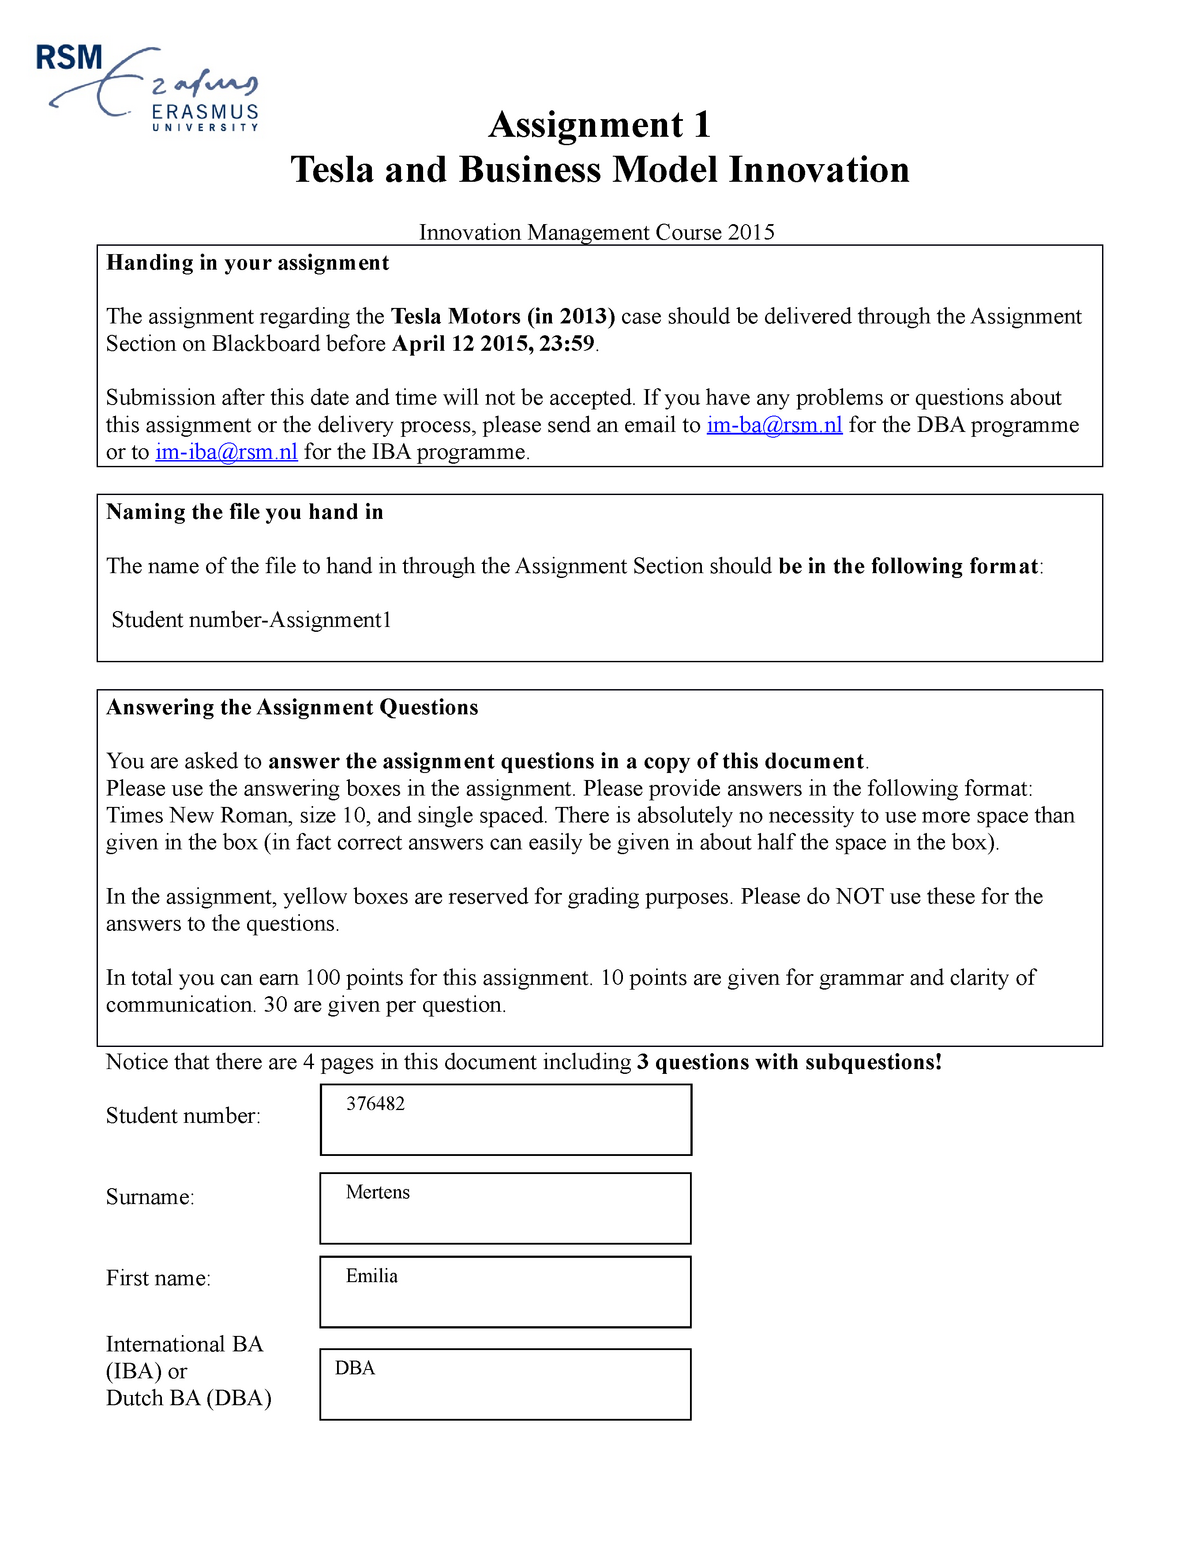 Verplichte Opgaven - Assignment 1: Tesla And Business Model